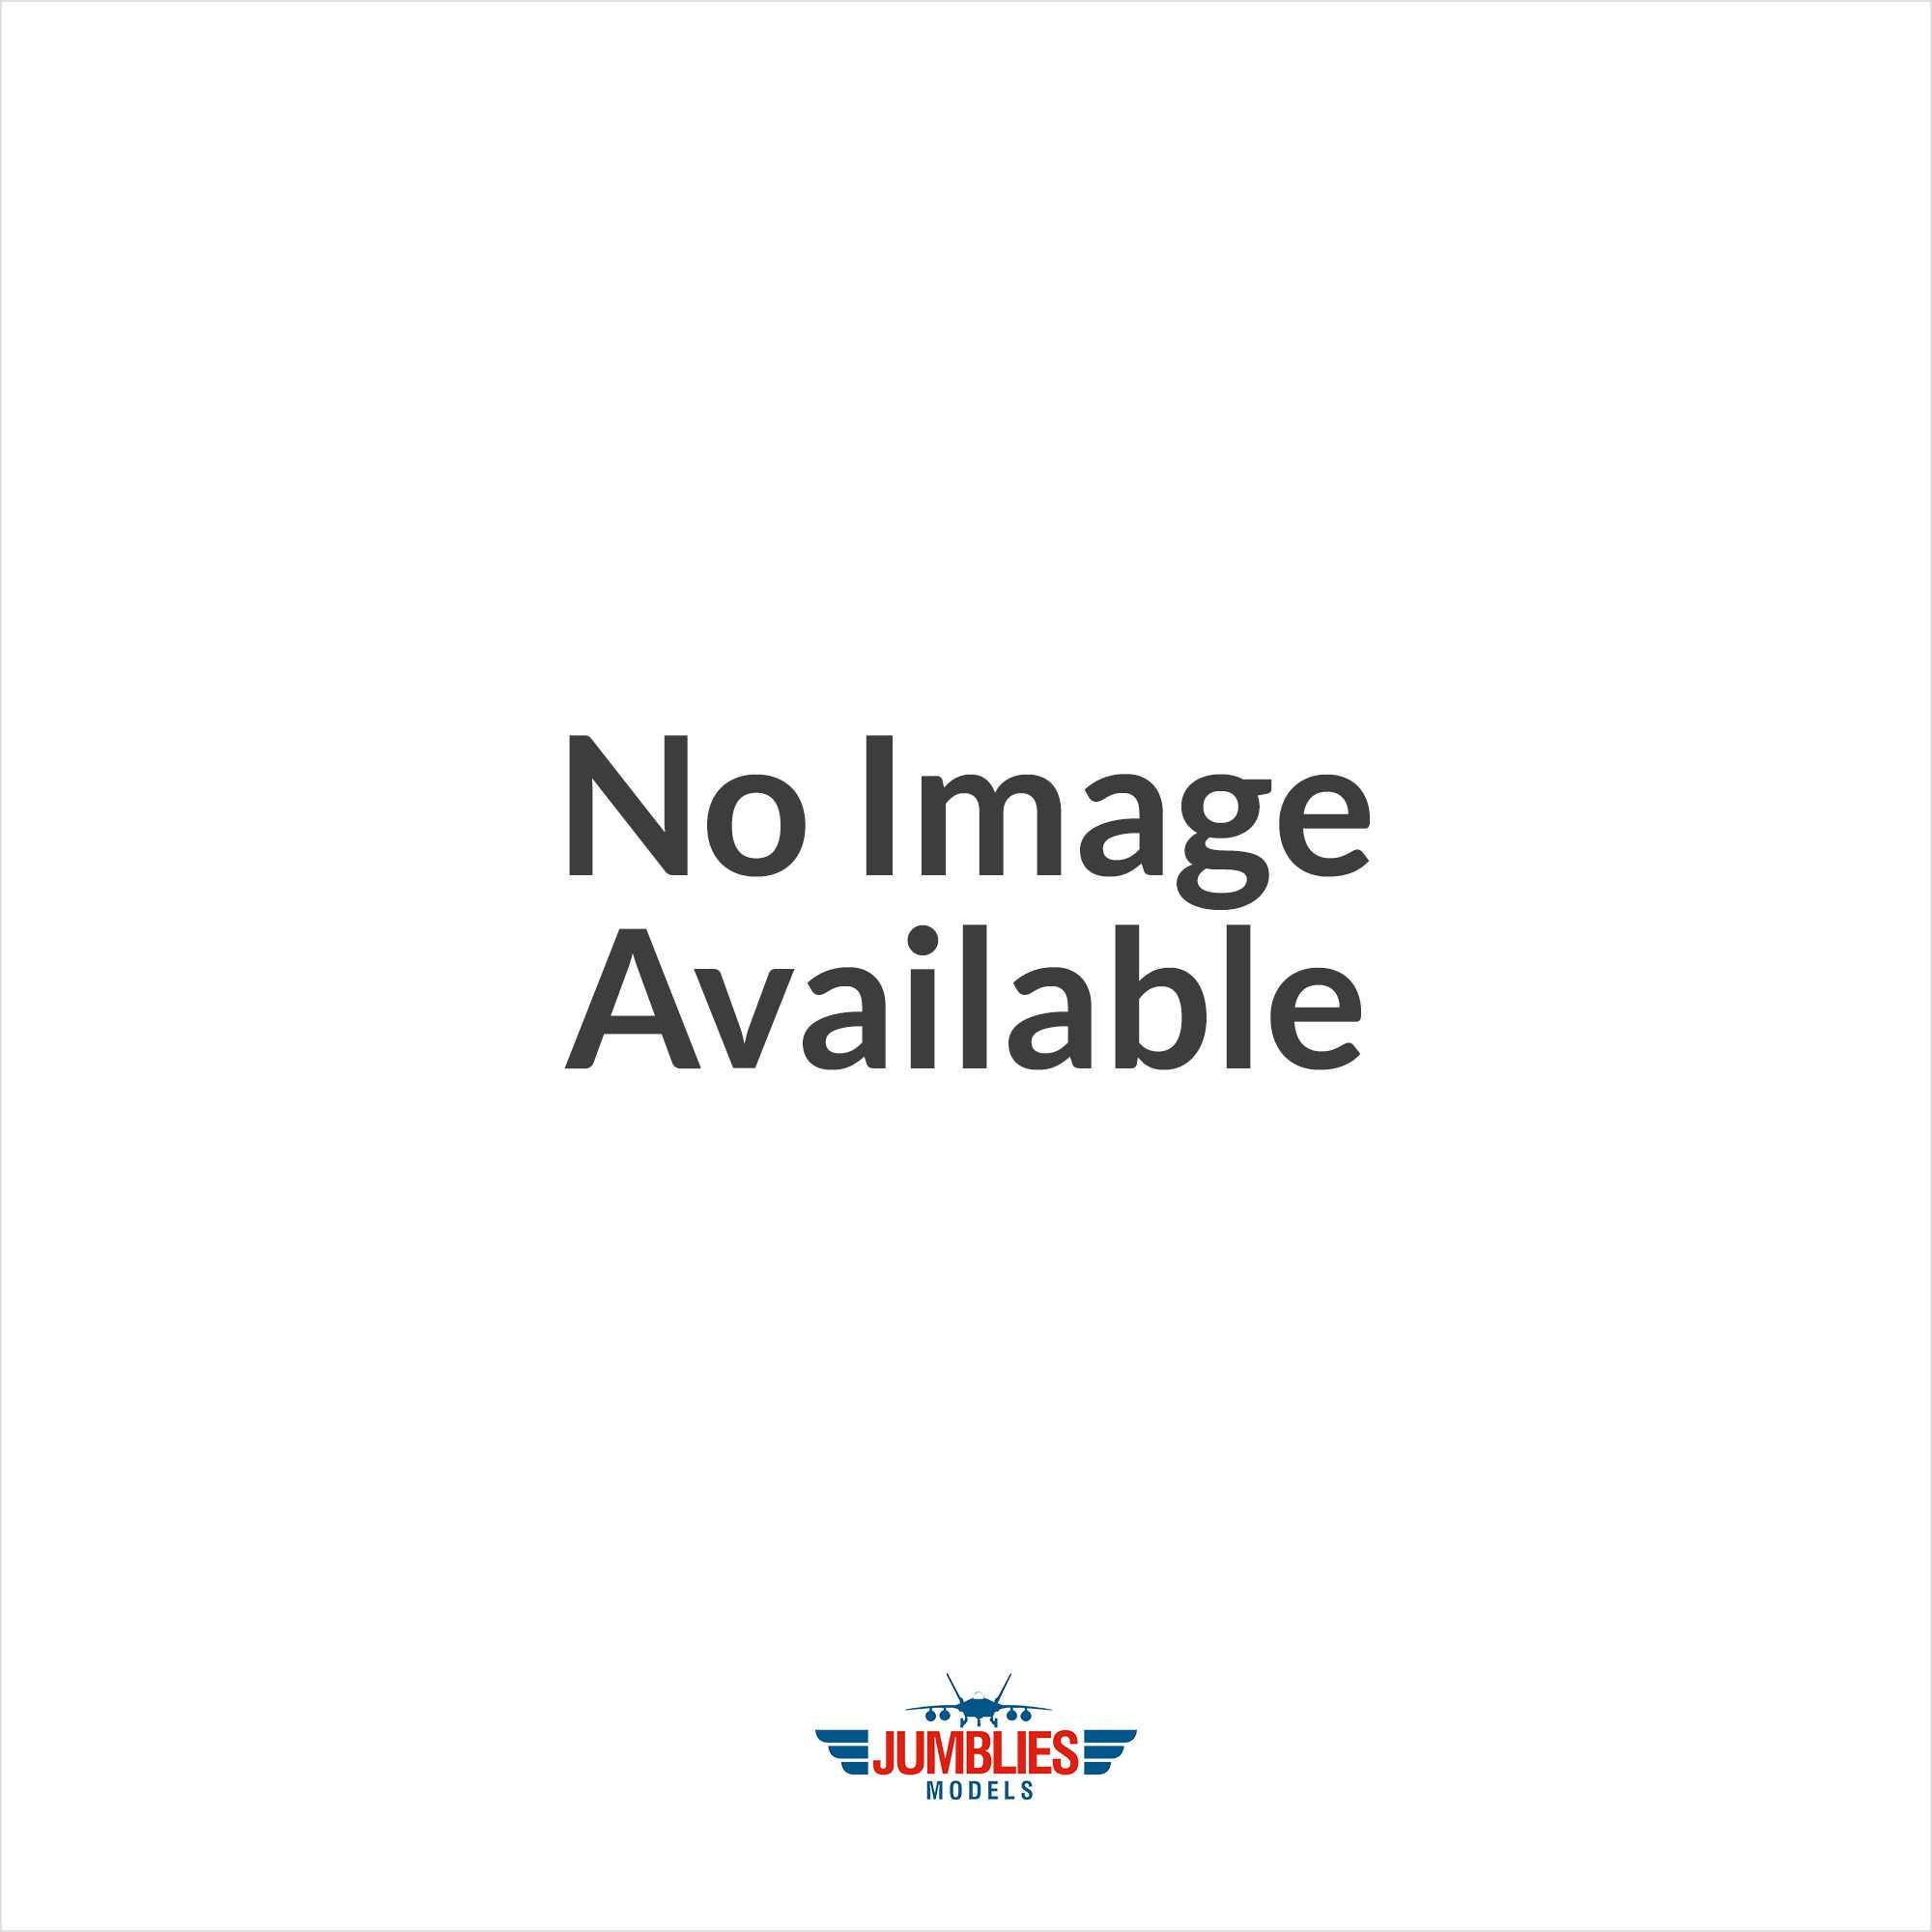 Moebius Models 1:32 BattleStar Galactica Colonial Viper MkII & Pilot Figure Model Kit